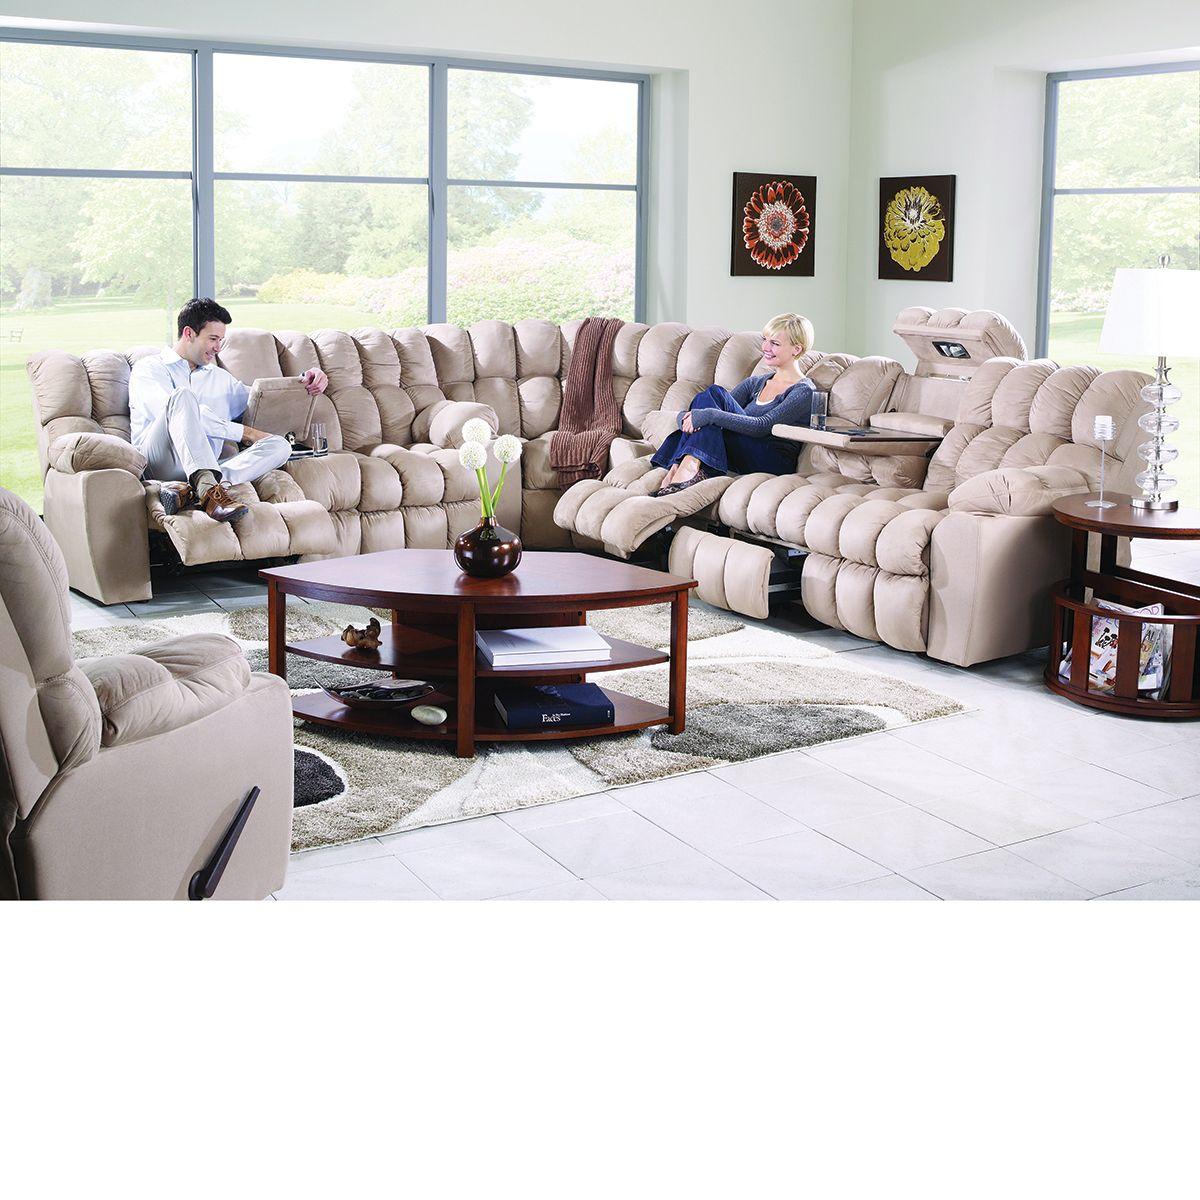 Null Luxe Furniture Furniture Furniture Outlet